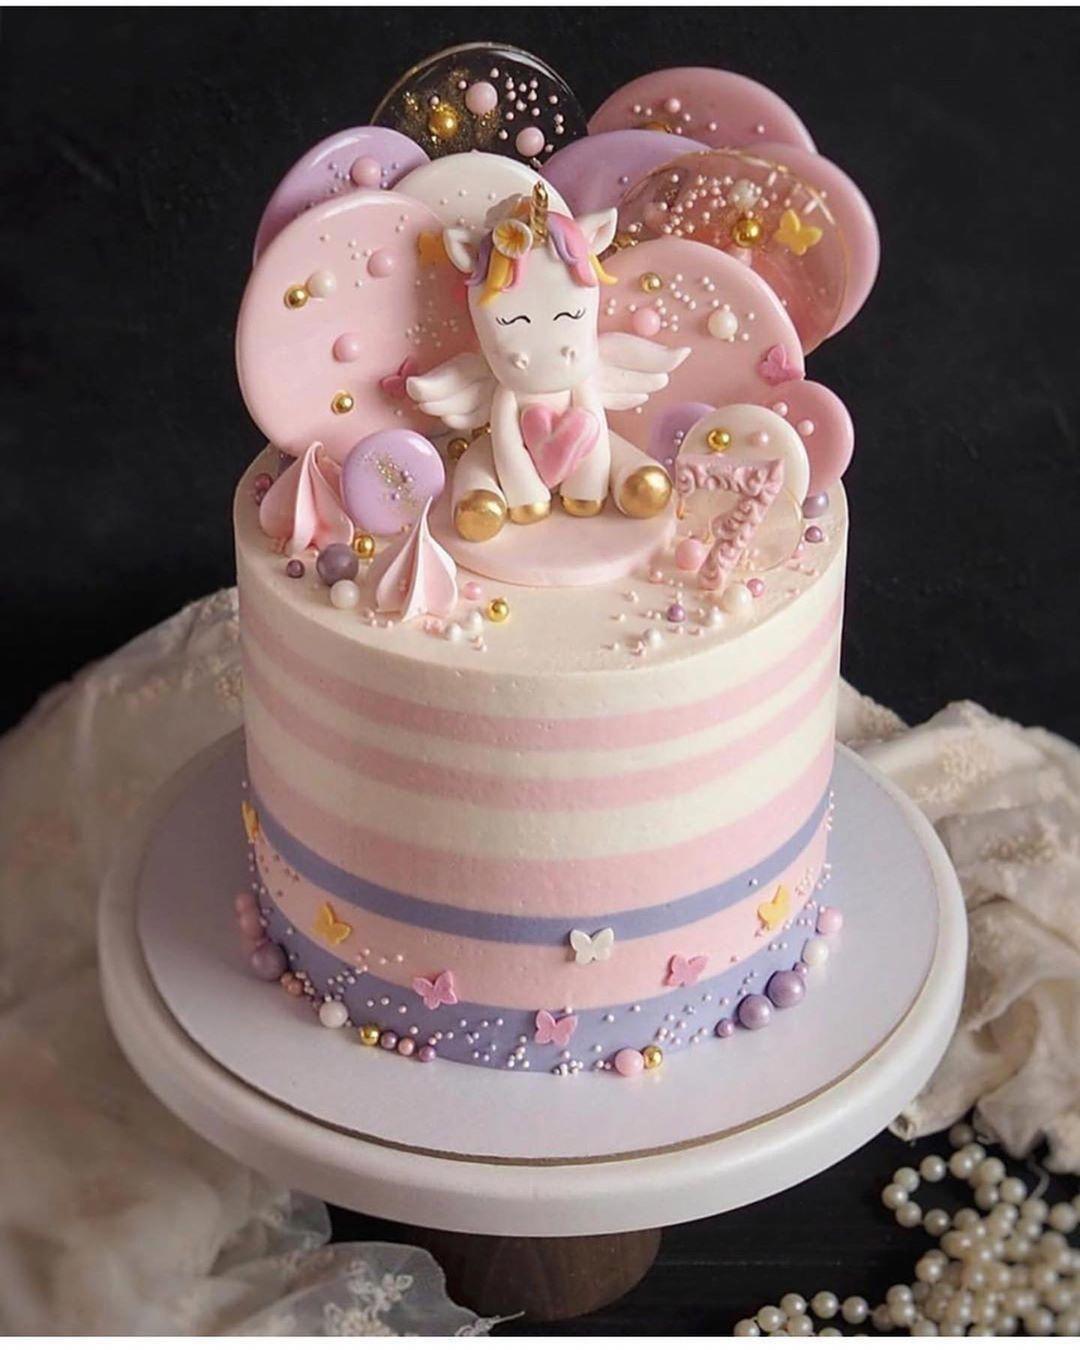 20 Stunning Cute Cartoon Birthday Cake Ideas in 2020